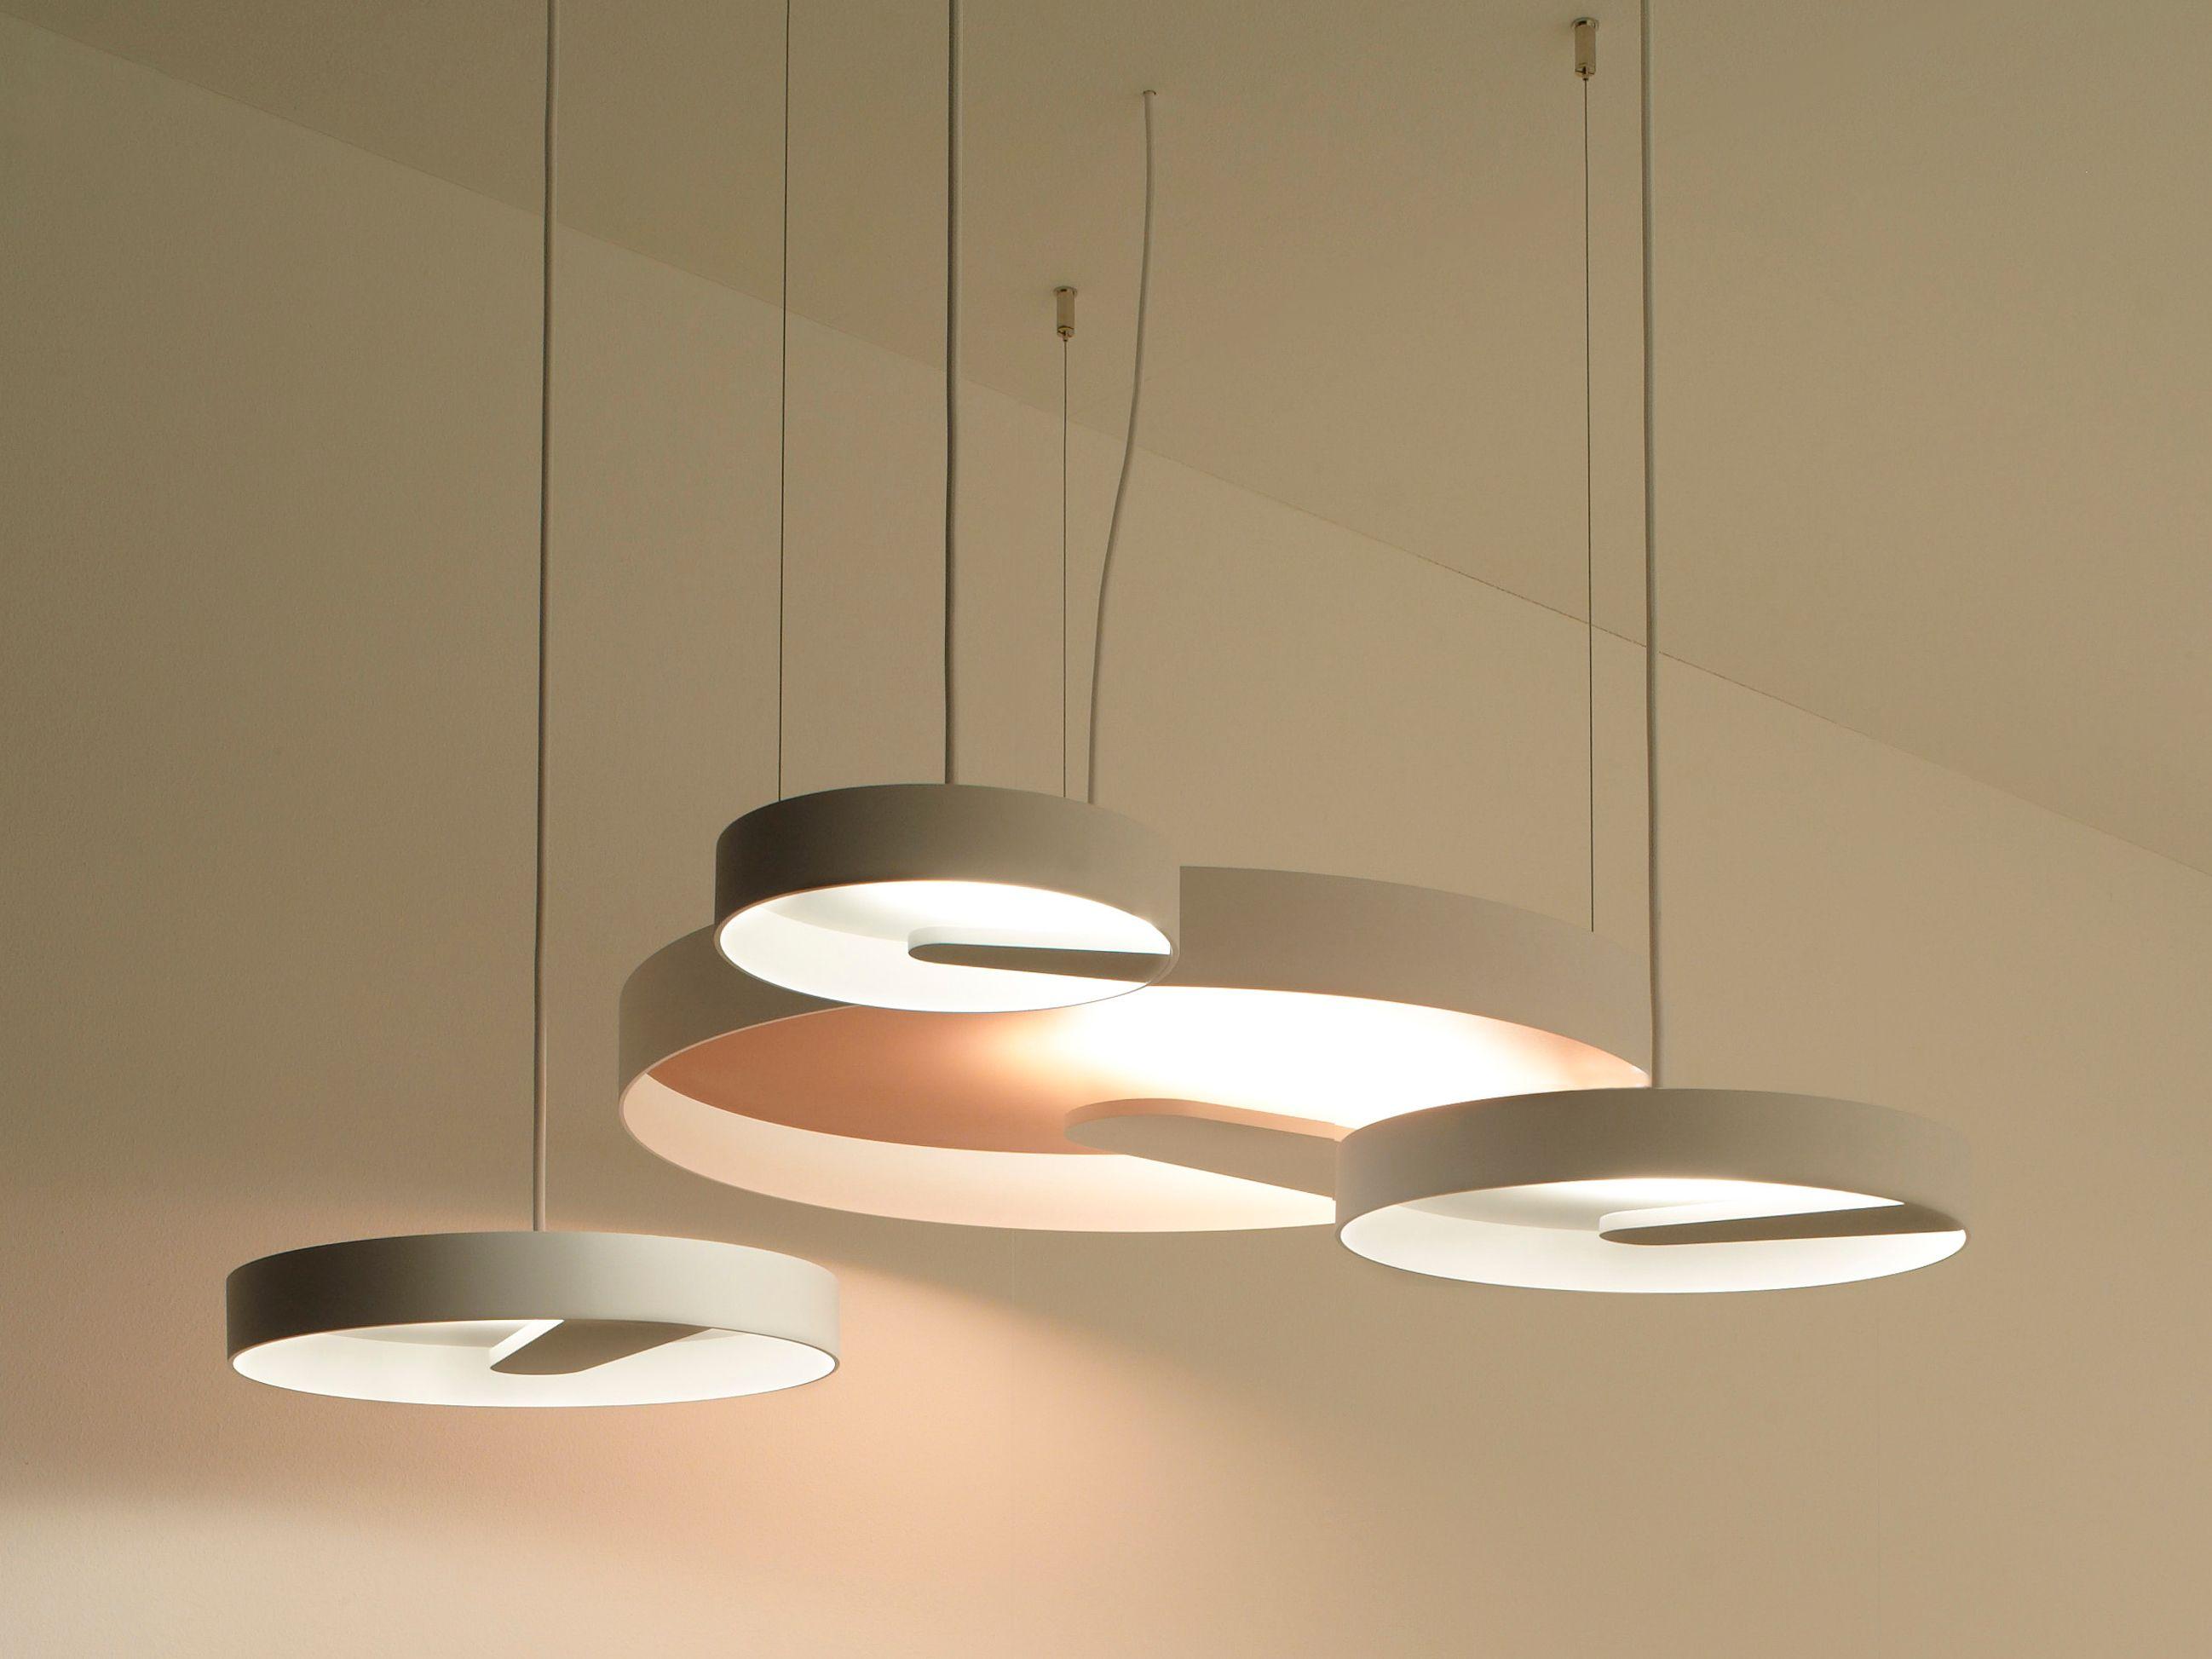 Lipps pendelleuchte by trizo21 design luc ramael for Design pendelleuchte esszimmer